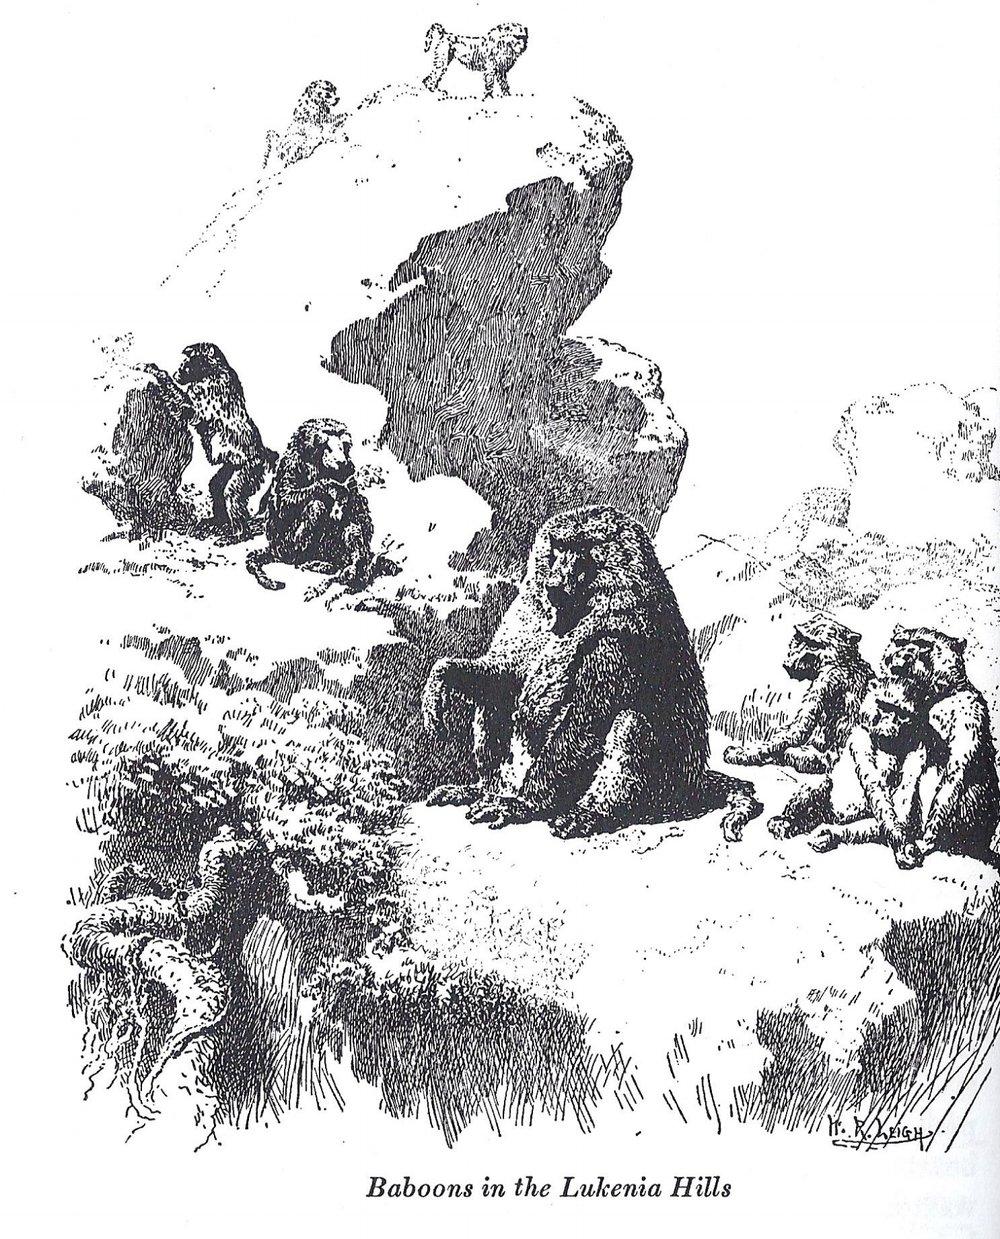 Baboons in Lukenia hills.